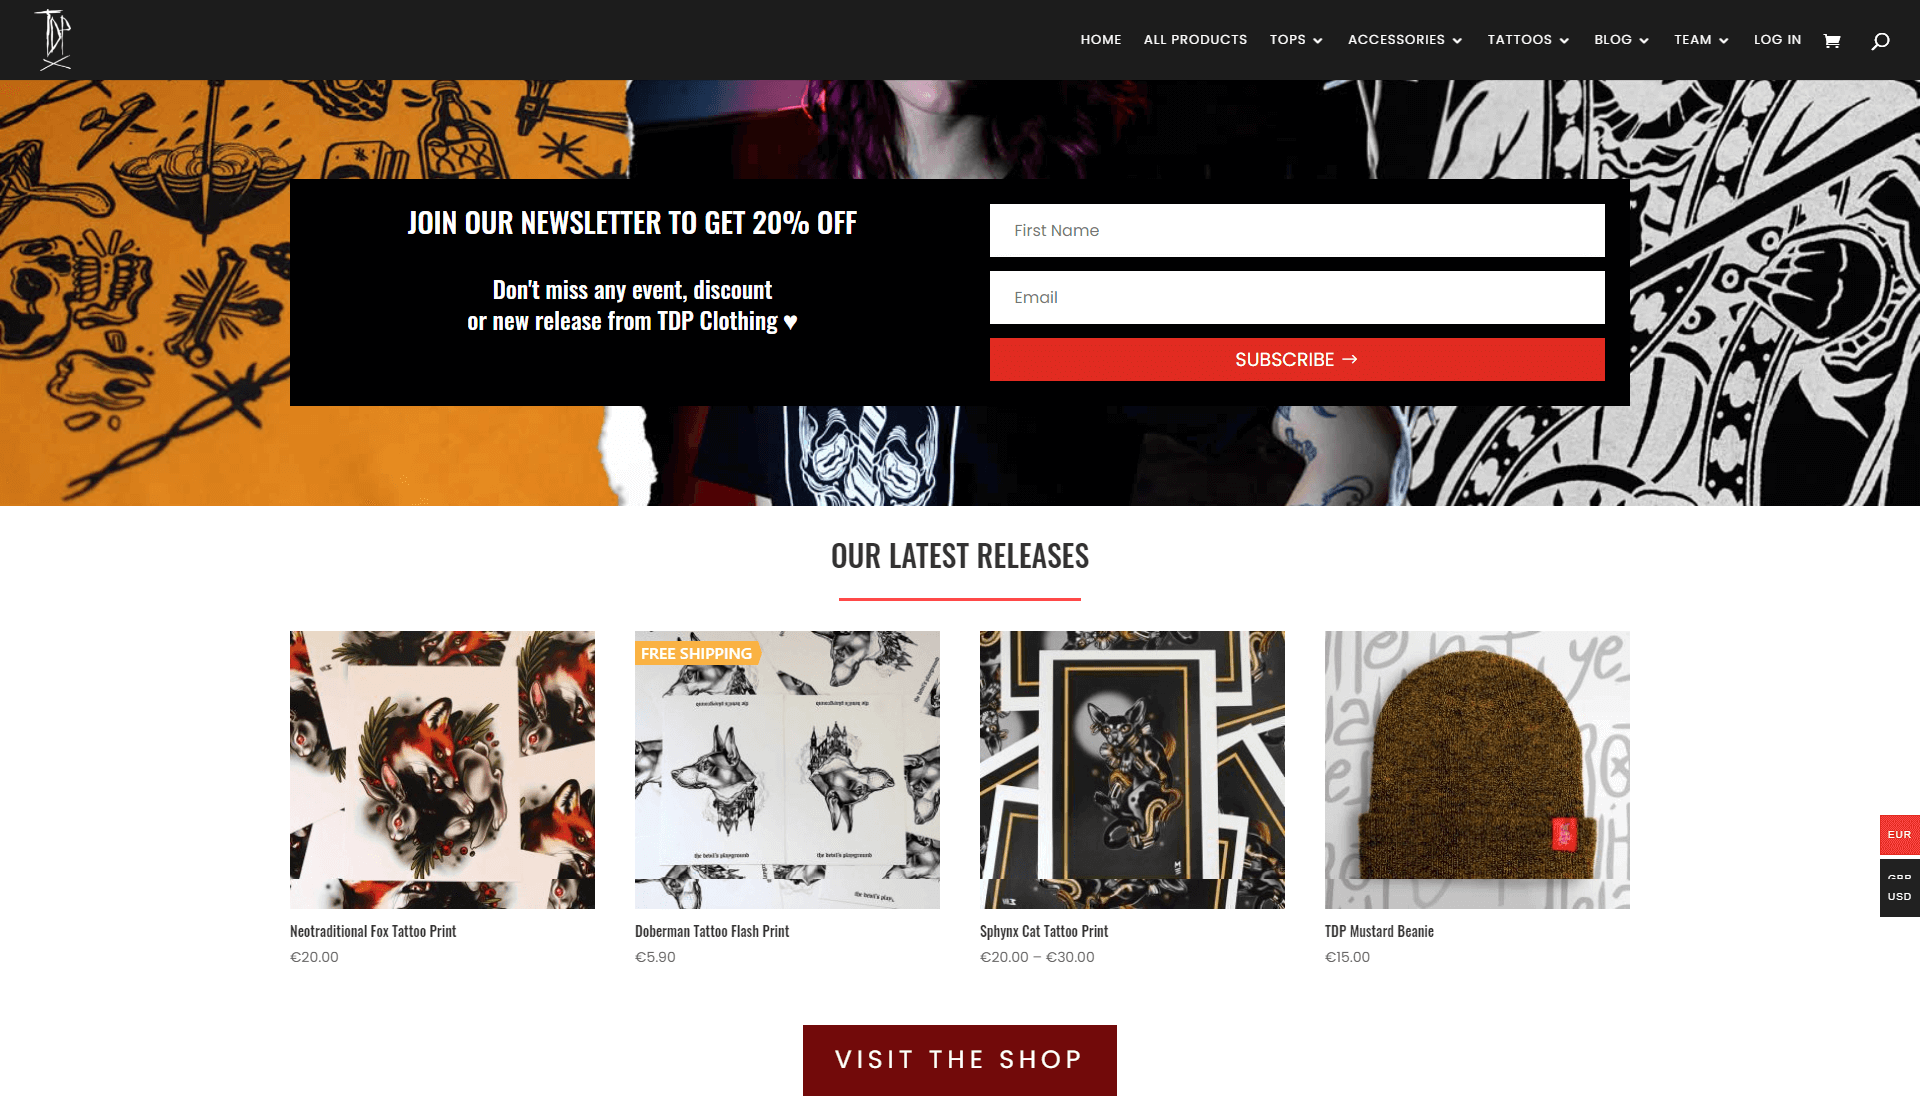 tdp clothing newsletter